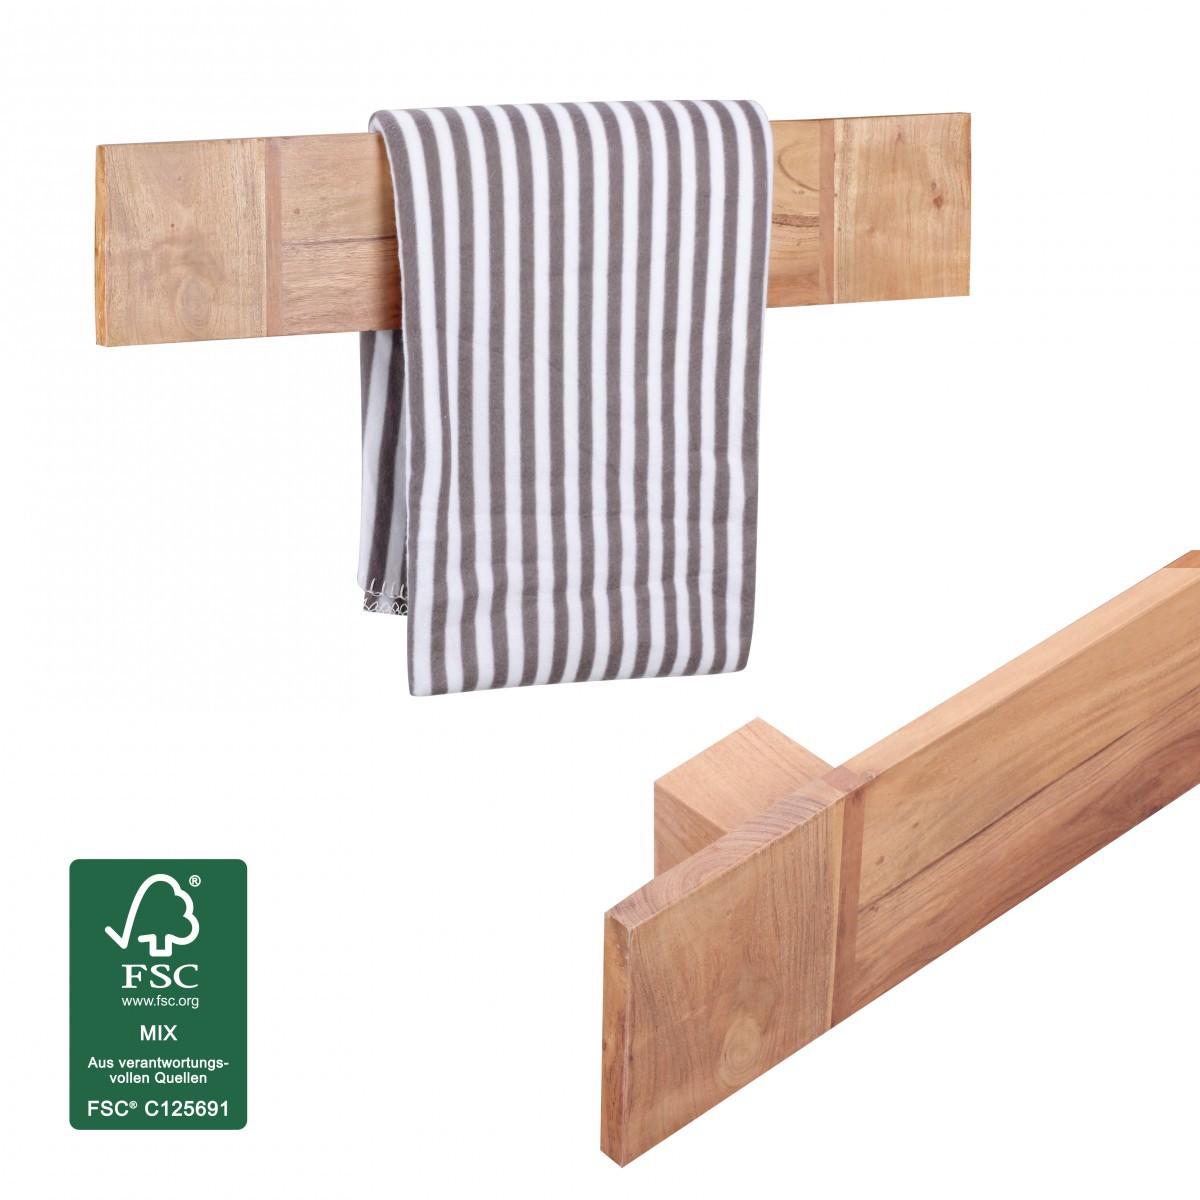 FineBuy Handtuchhalter Massivholz Akazie 80 Cm Wandregal Landhaus Stil Bad Zubehör  Badezimmer Möbel Natur Produkt 39856